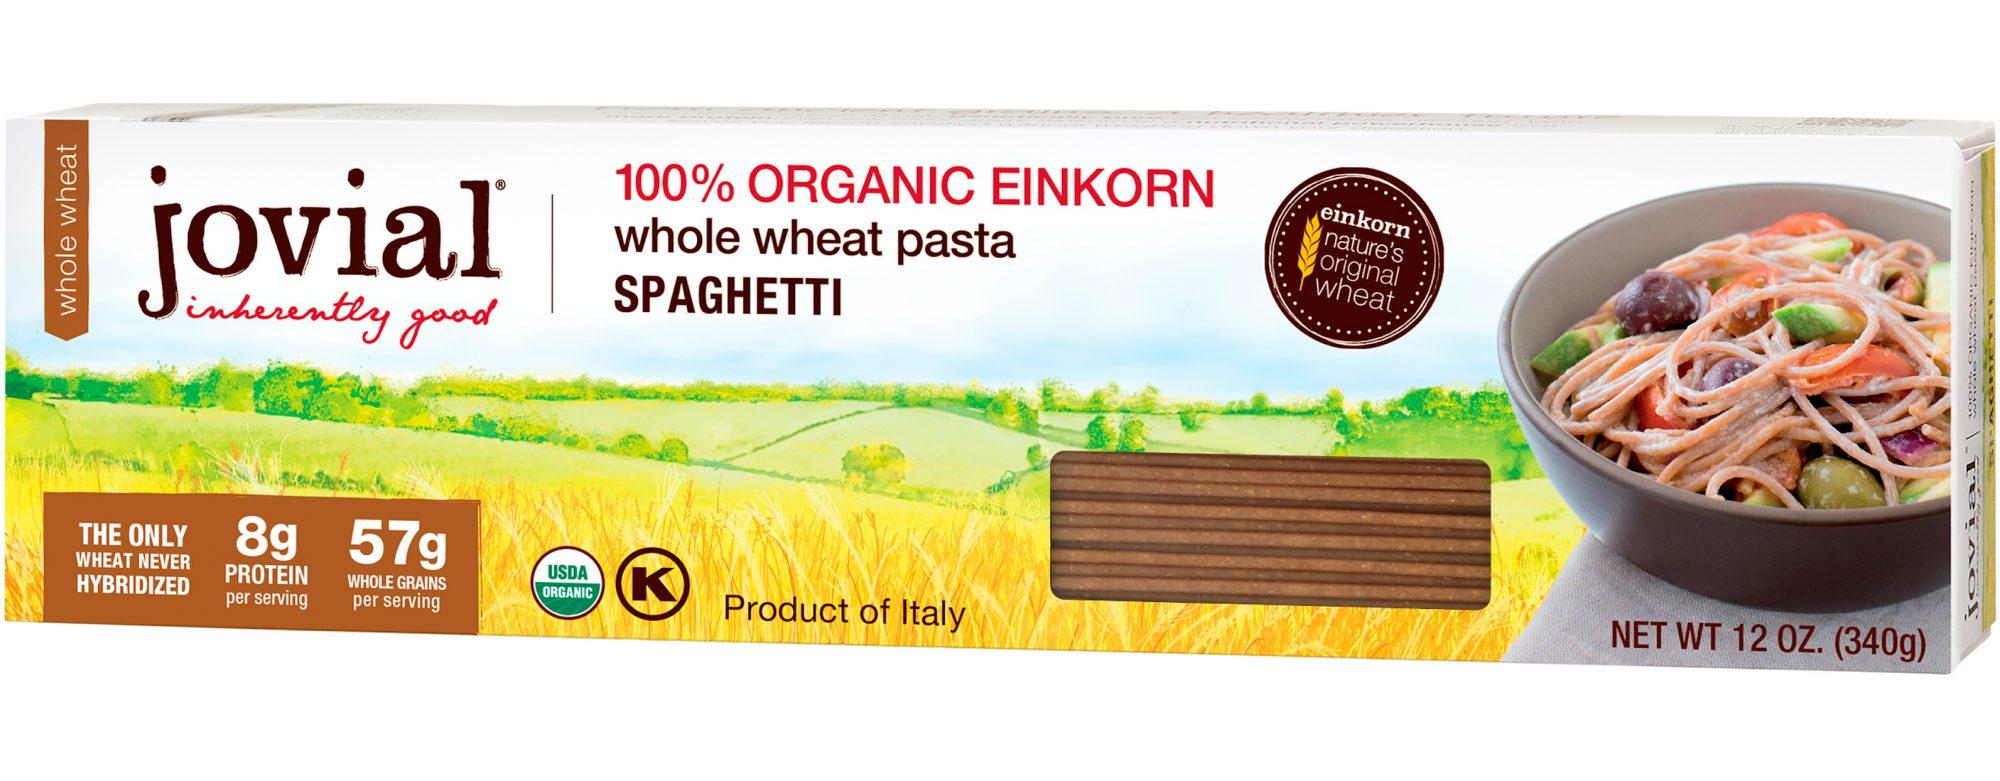 Product shot of the whole wheat einkorn spaghetti